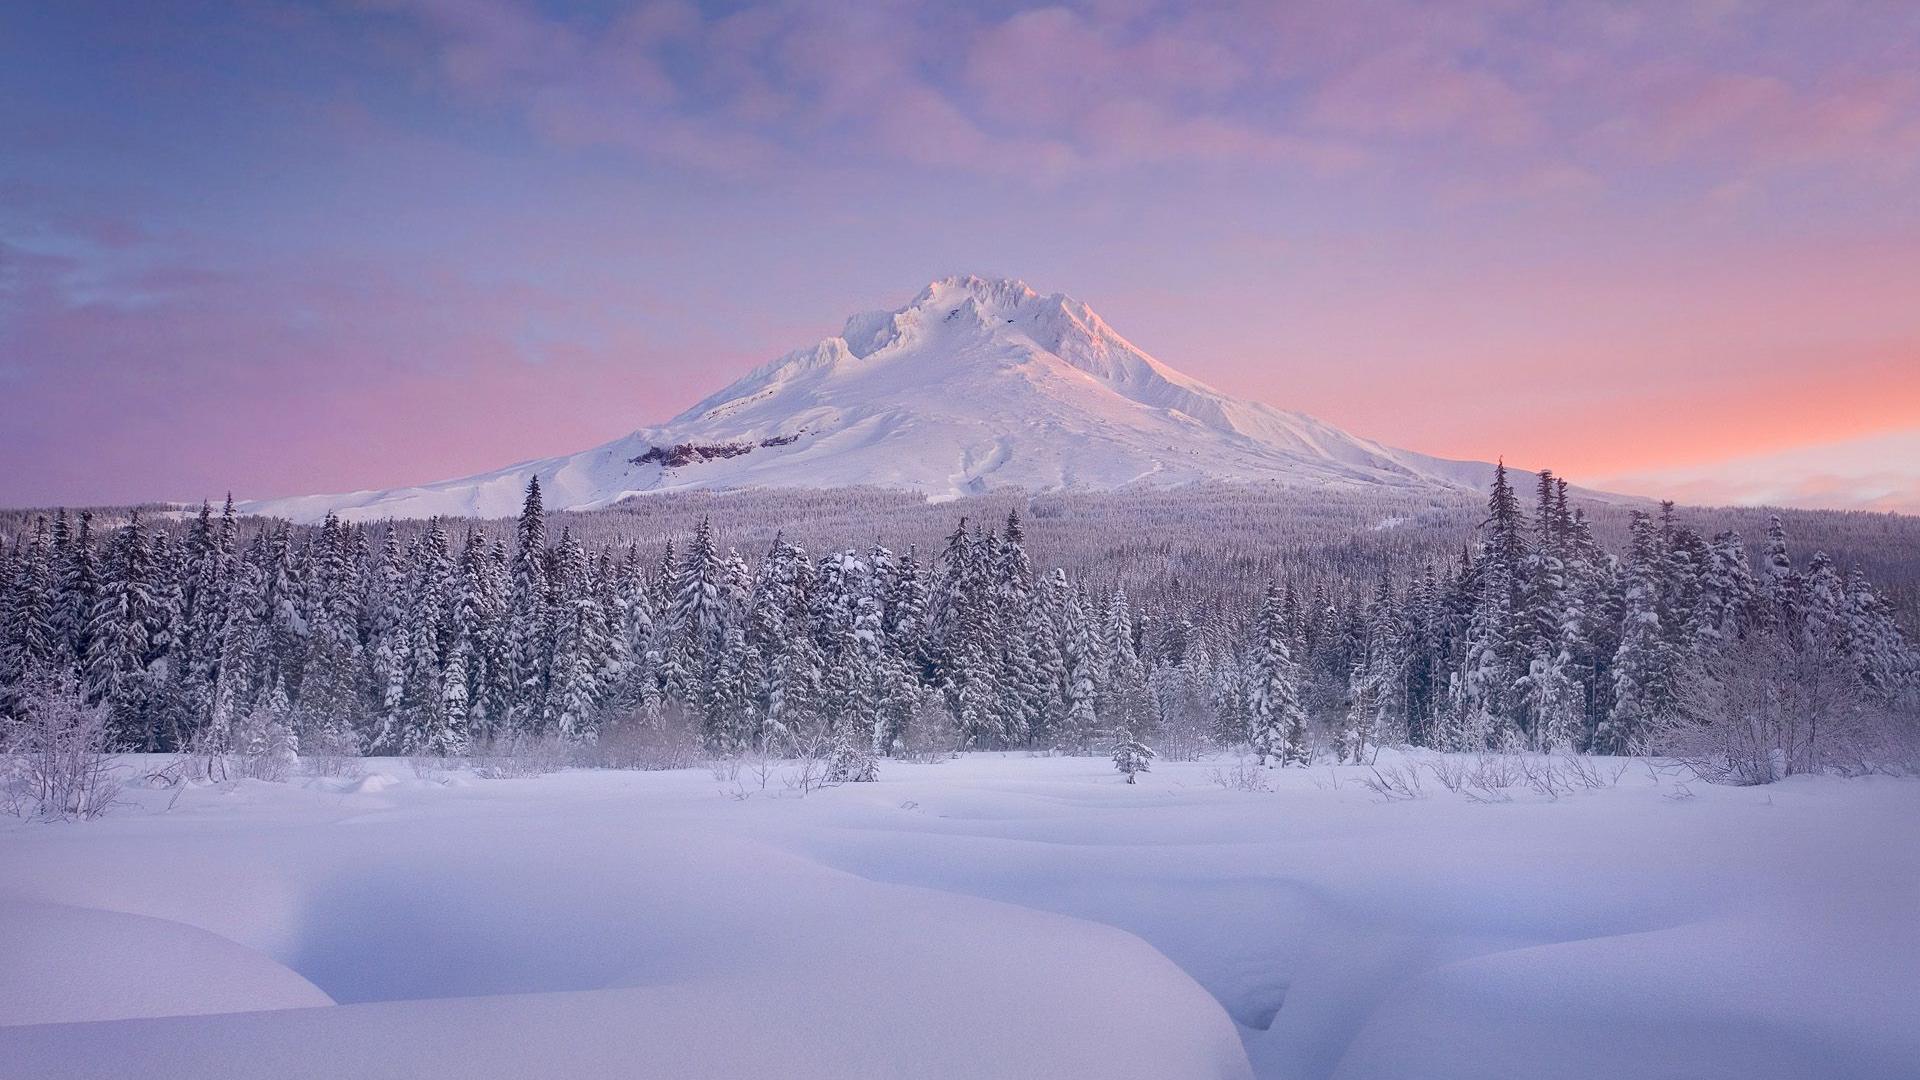 Winter Mountain wallpaper   796441 1920x1080